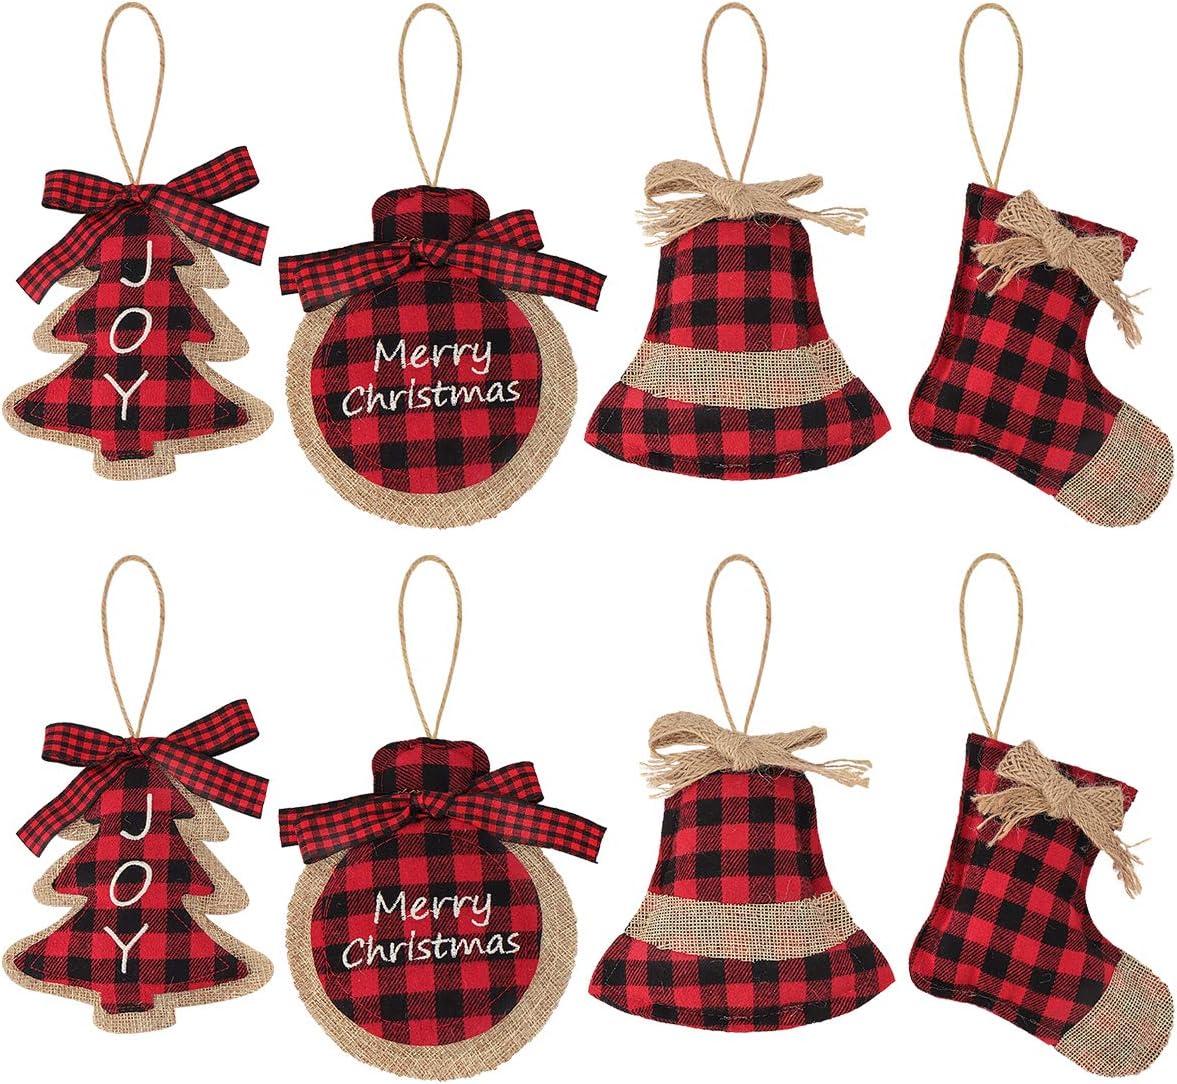 Ivenf Christmas Decorations Tree Ornament, 8 Pcs Red Black Buffalo Check Plaid Stitching Burlap Hanging Ornaments, Tree Ball Bell Stocking Shaped Hanging Decor for Holiday Xmas Party Decorations Gift